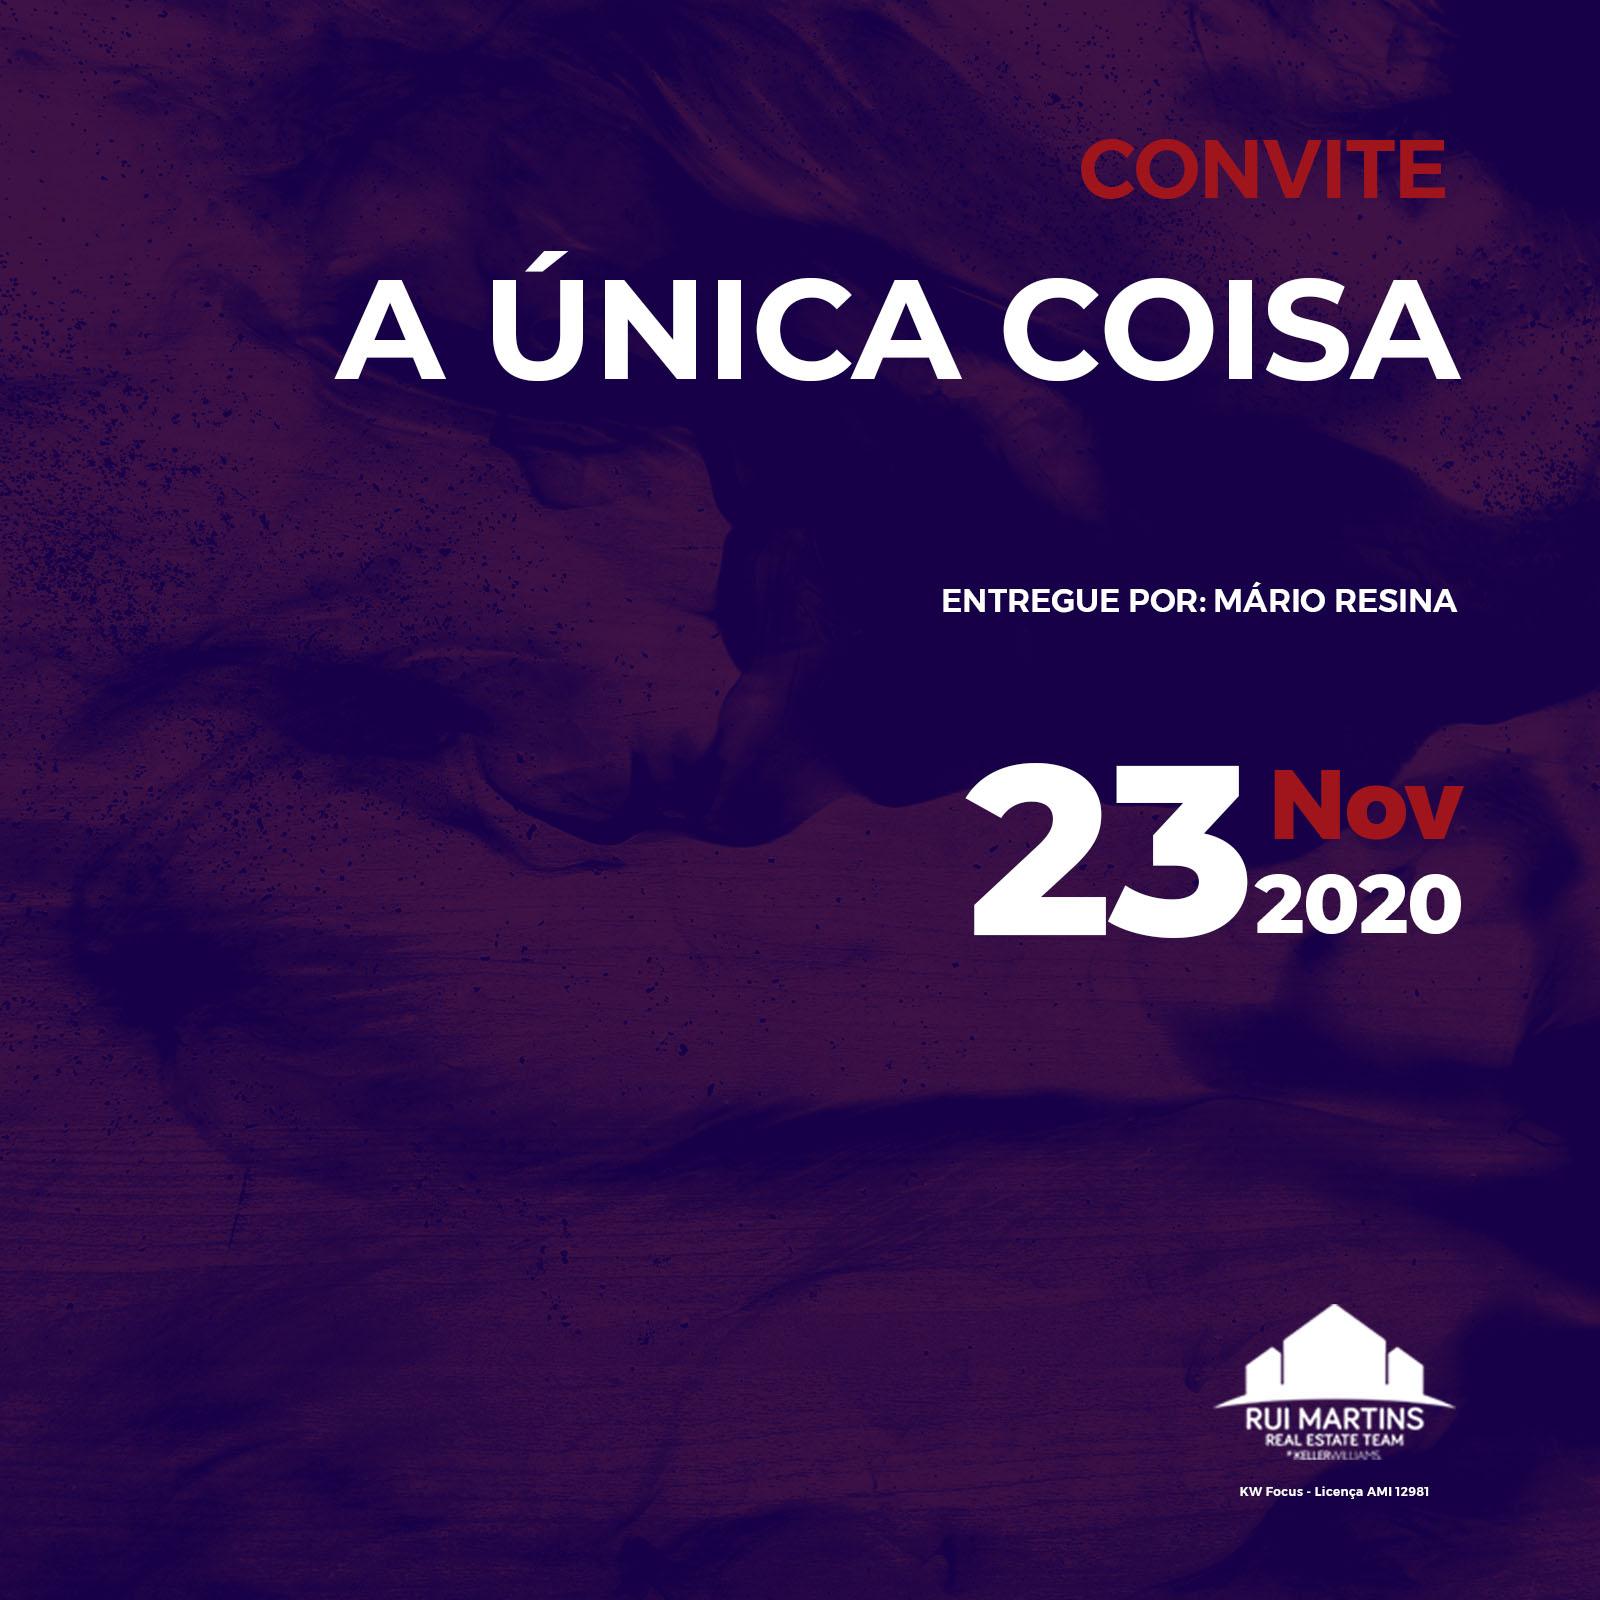 convite evento 23 nov